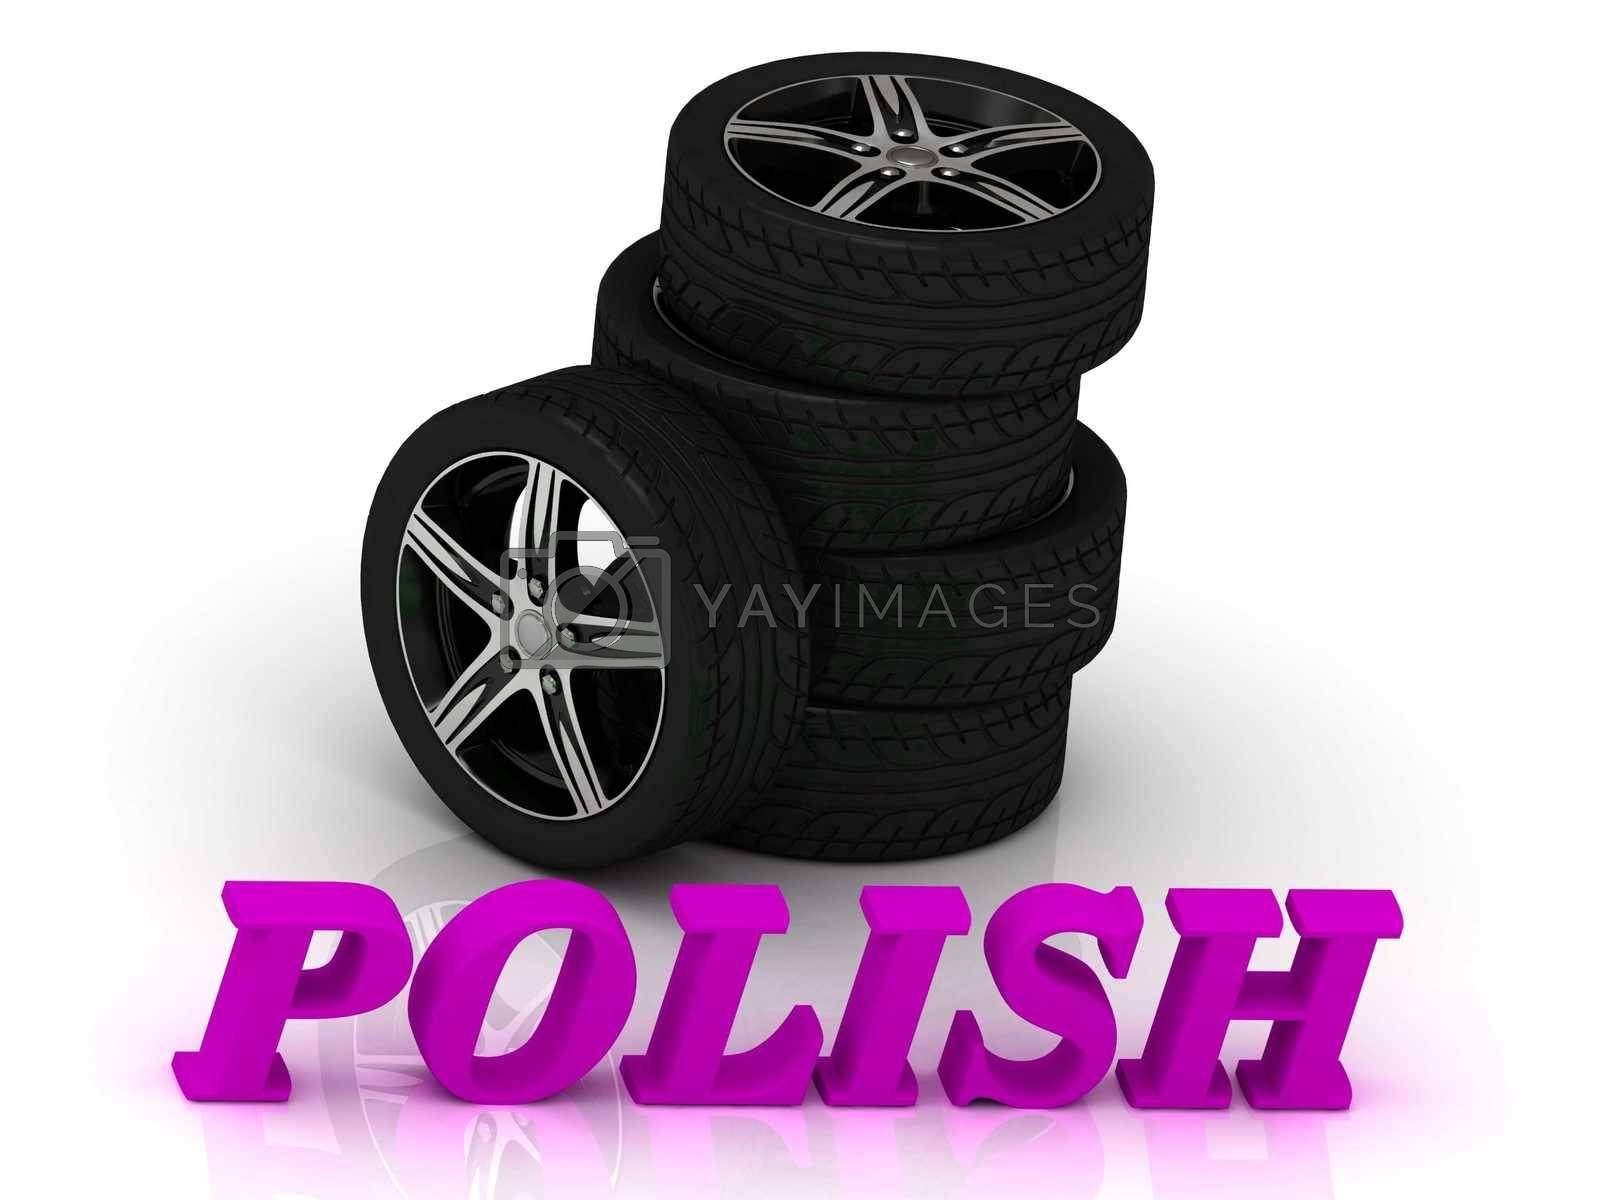 POLISH- bright letters and rims mashine black wheels on a white background